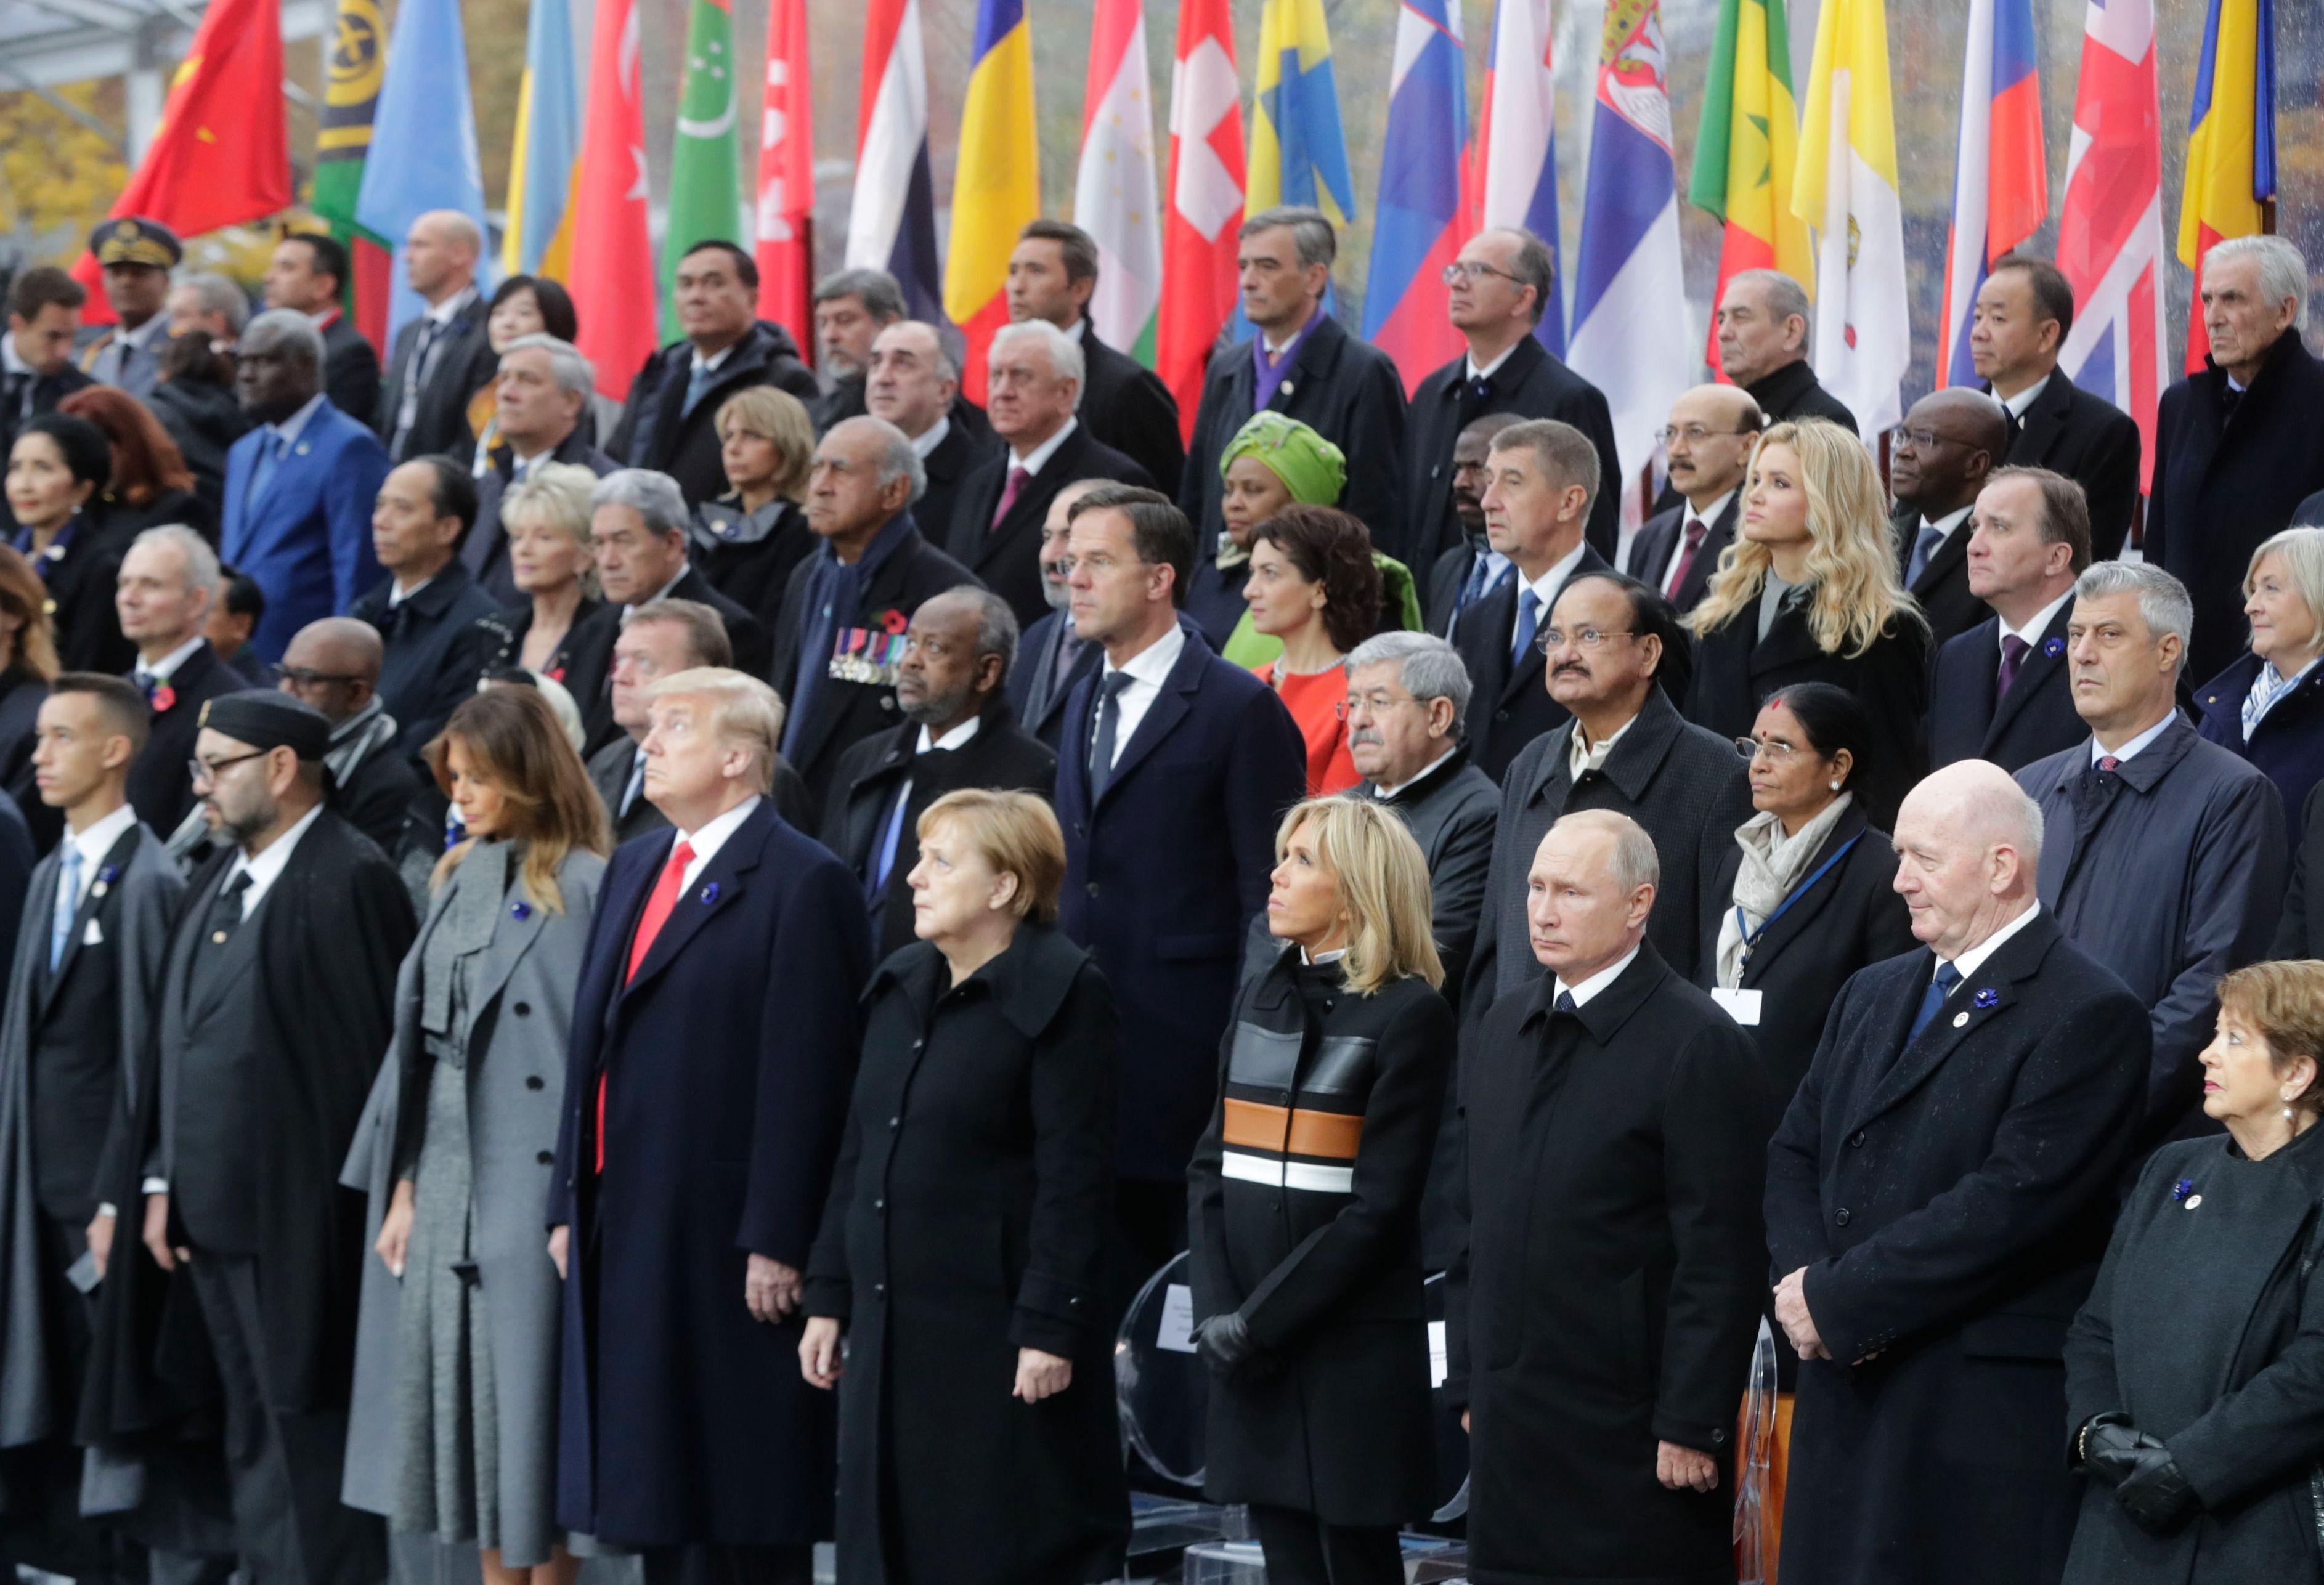 World leaders assemble